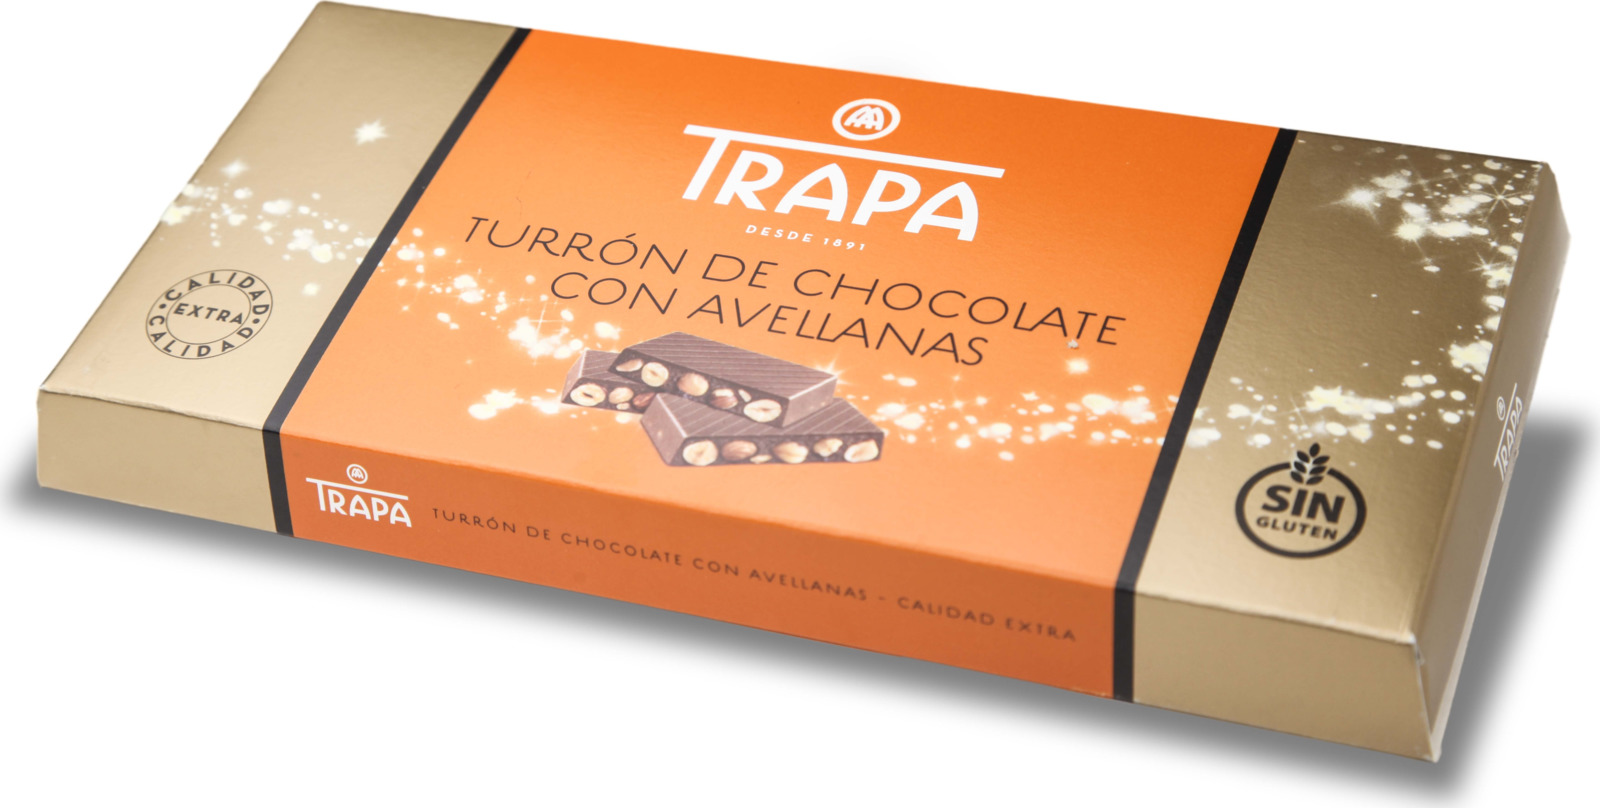 Молочный шоколад Trapa Turron, с цельным фундуком, 200 г молочный шоколад trapa corazоn bar с апельсиновой начинкой 100 г